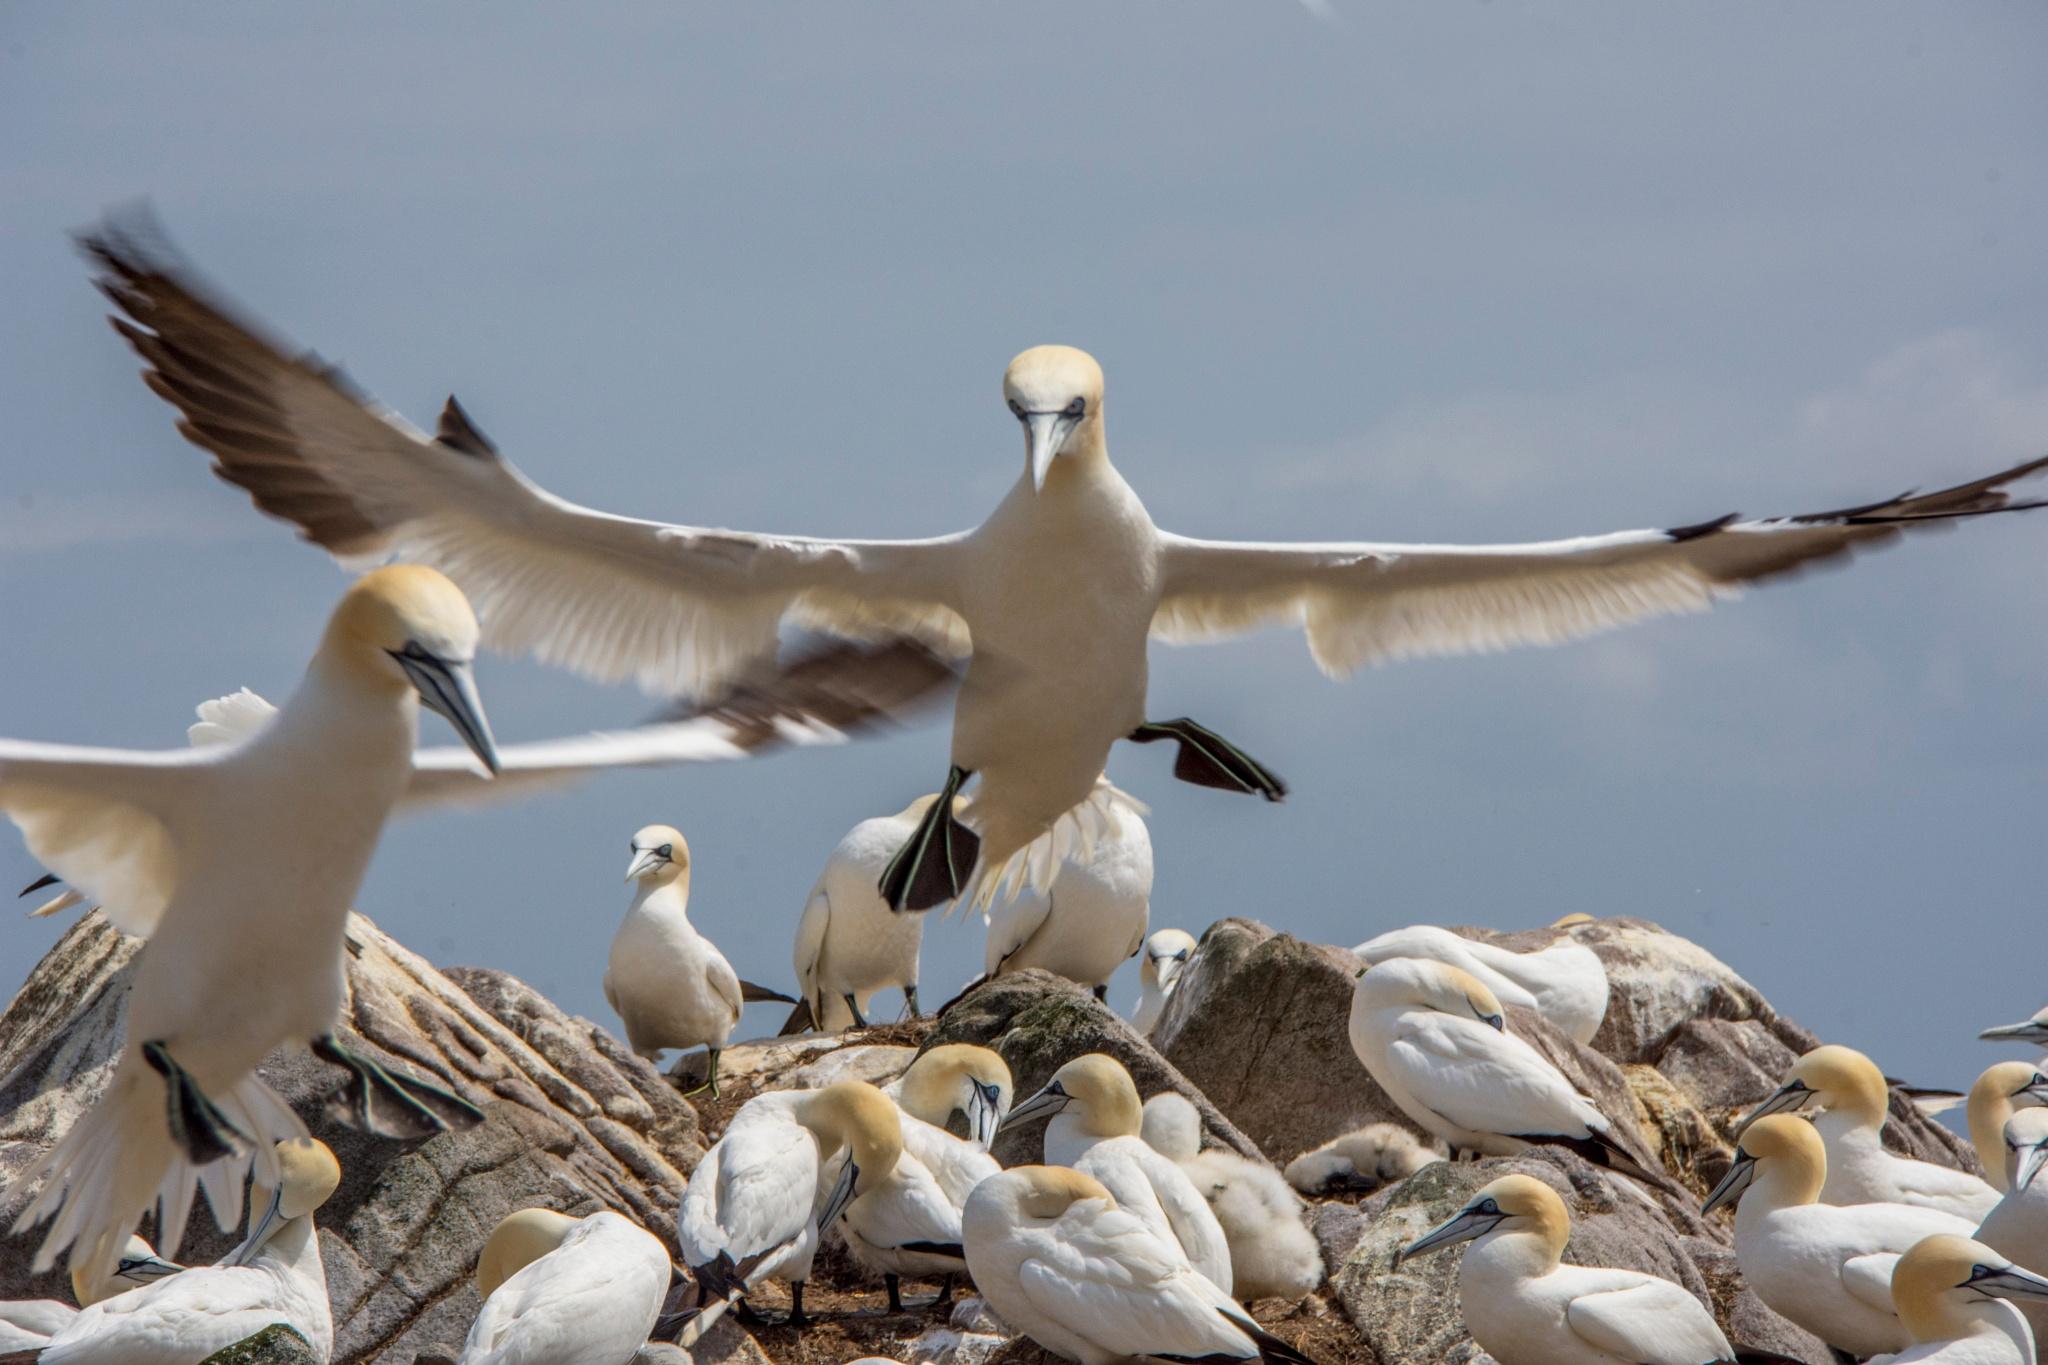 Gannet colony on The Saltee Islands. by Pat kehoe